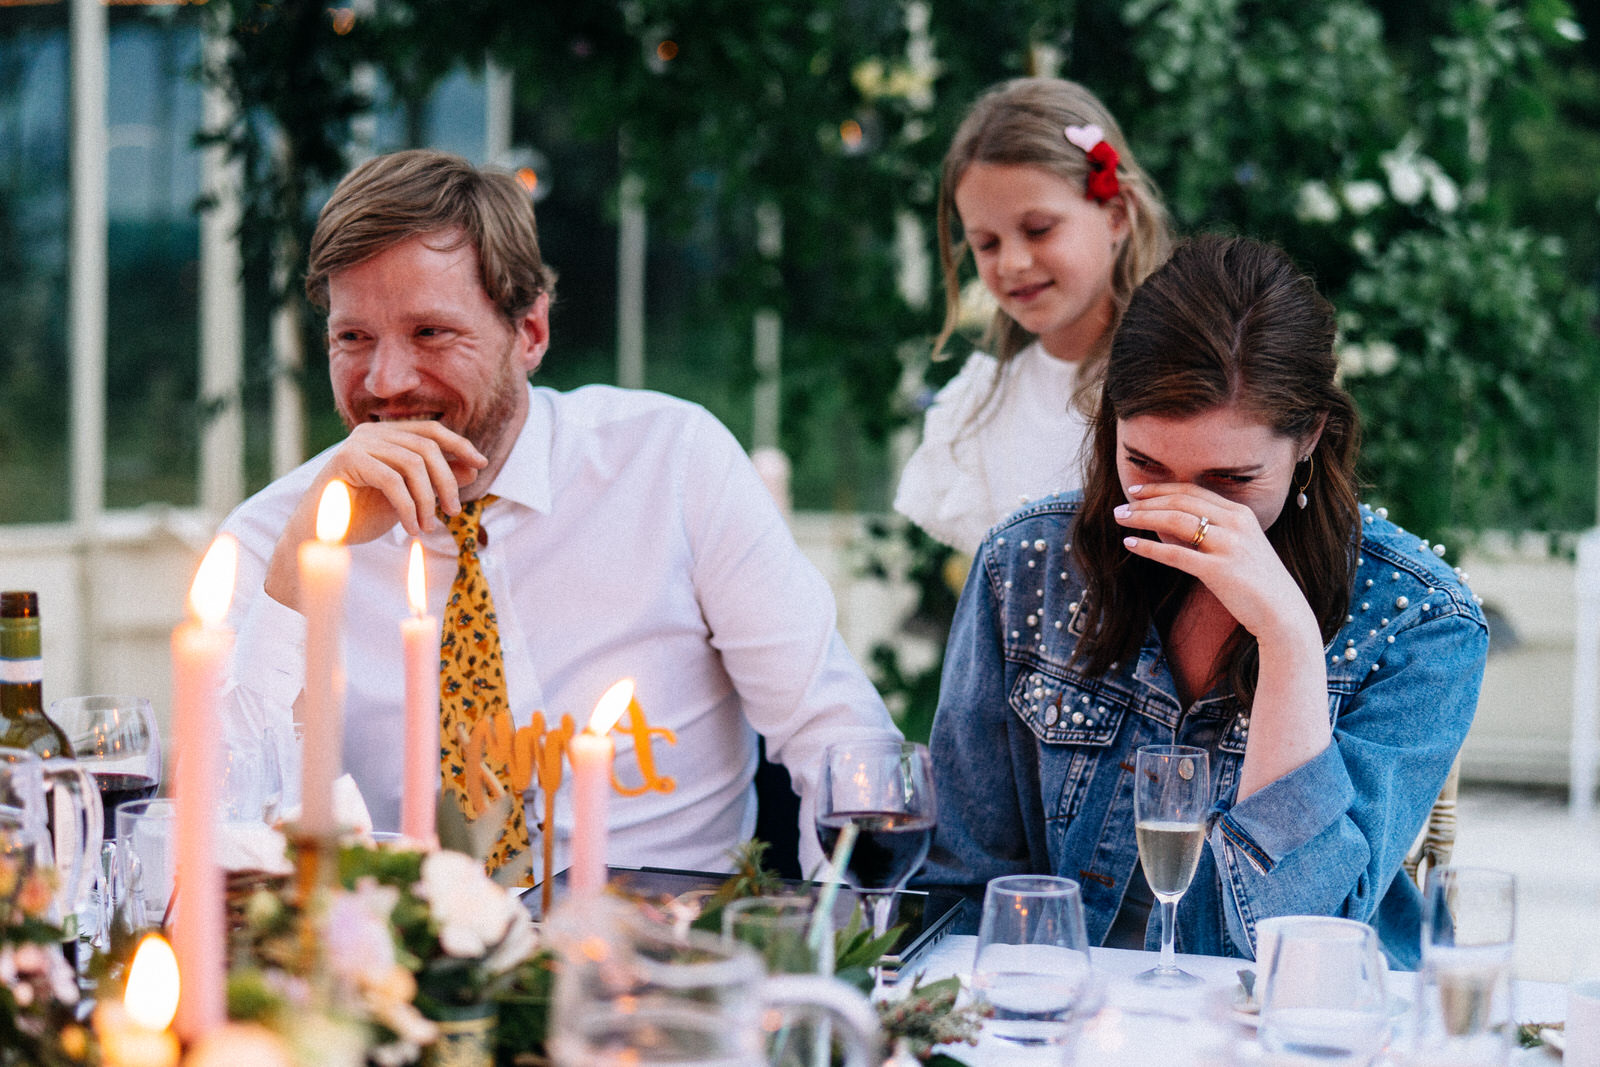 Cork documentary wedding photography 0180 179